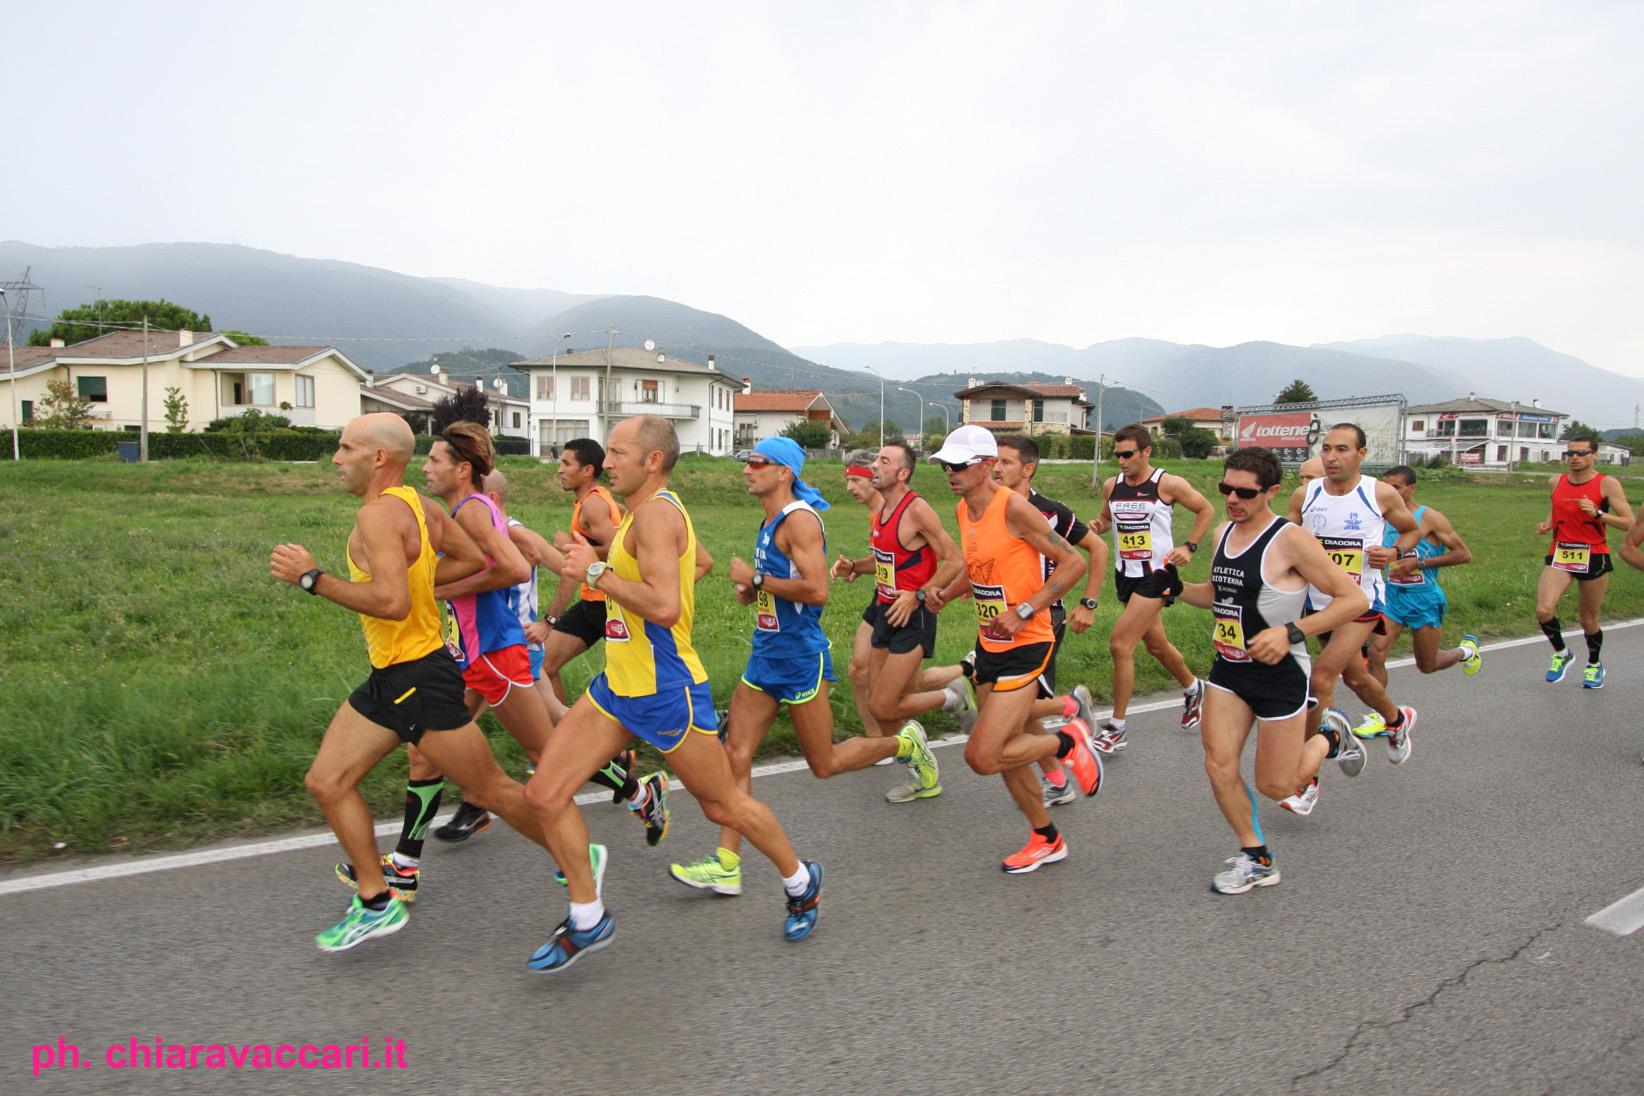 Le foto degli atleti – Mezza maratona del Brenta 2013